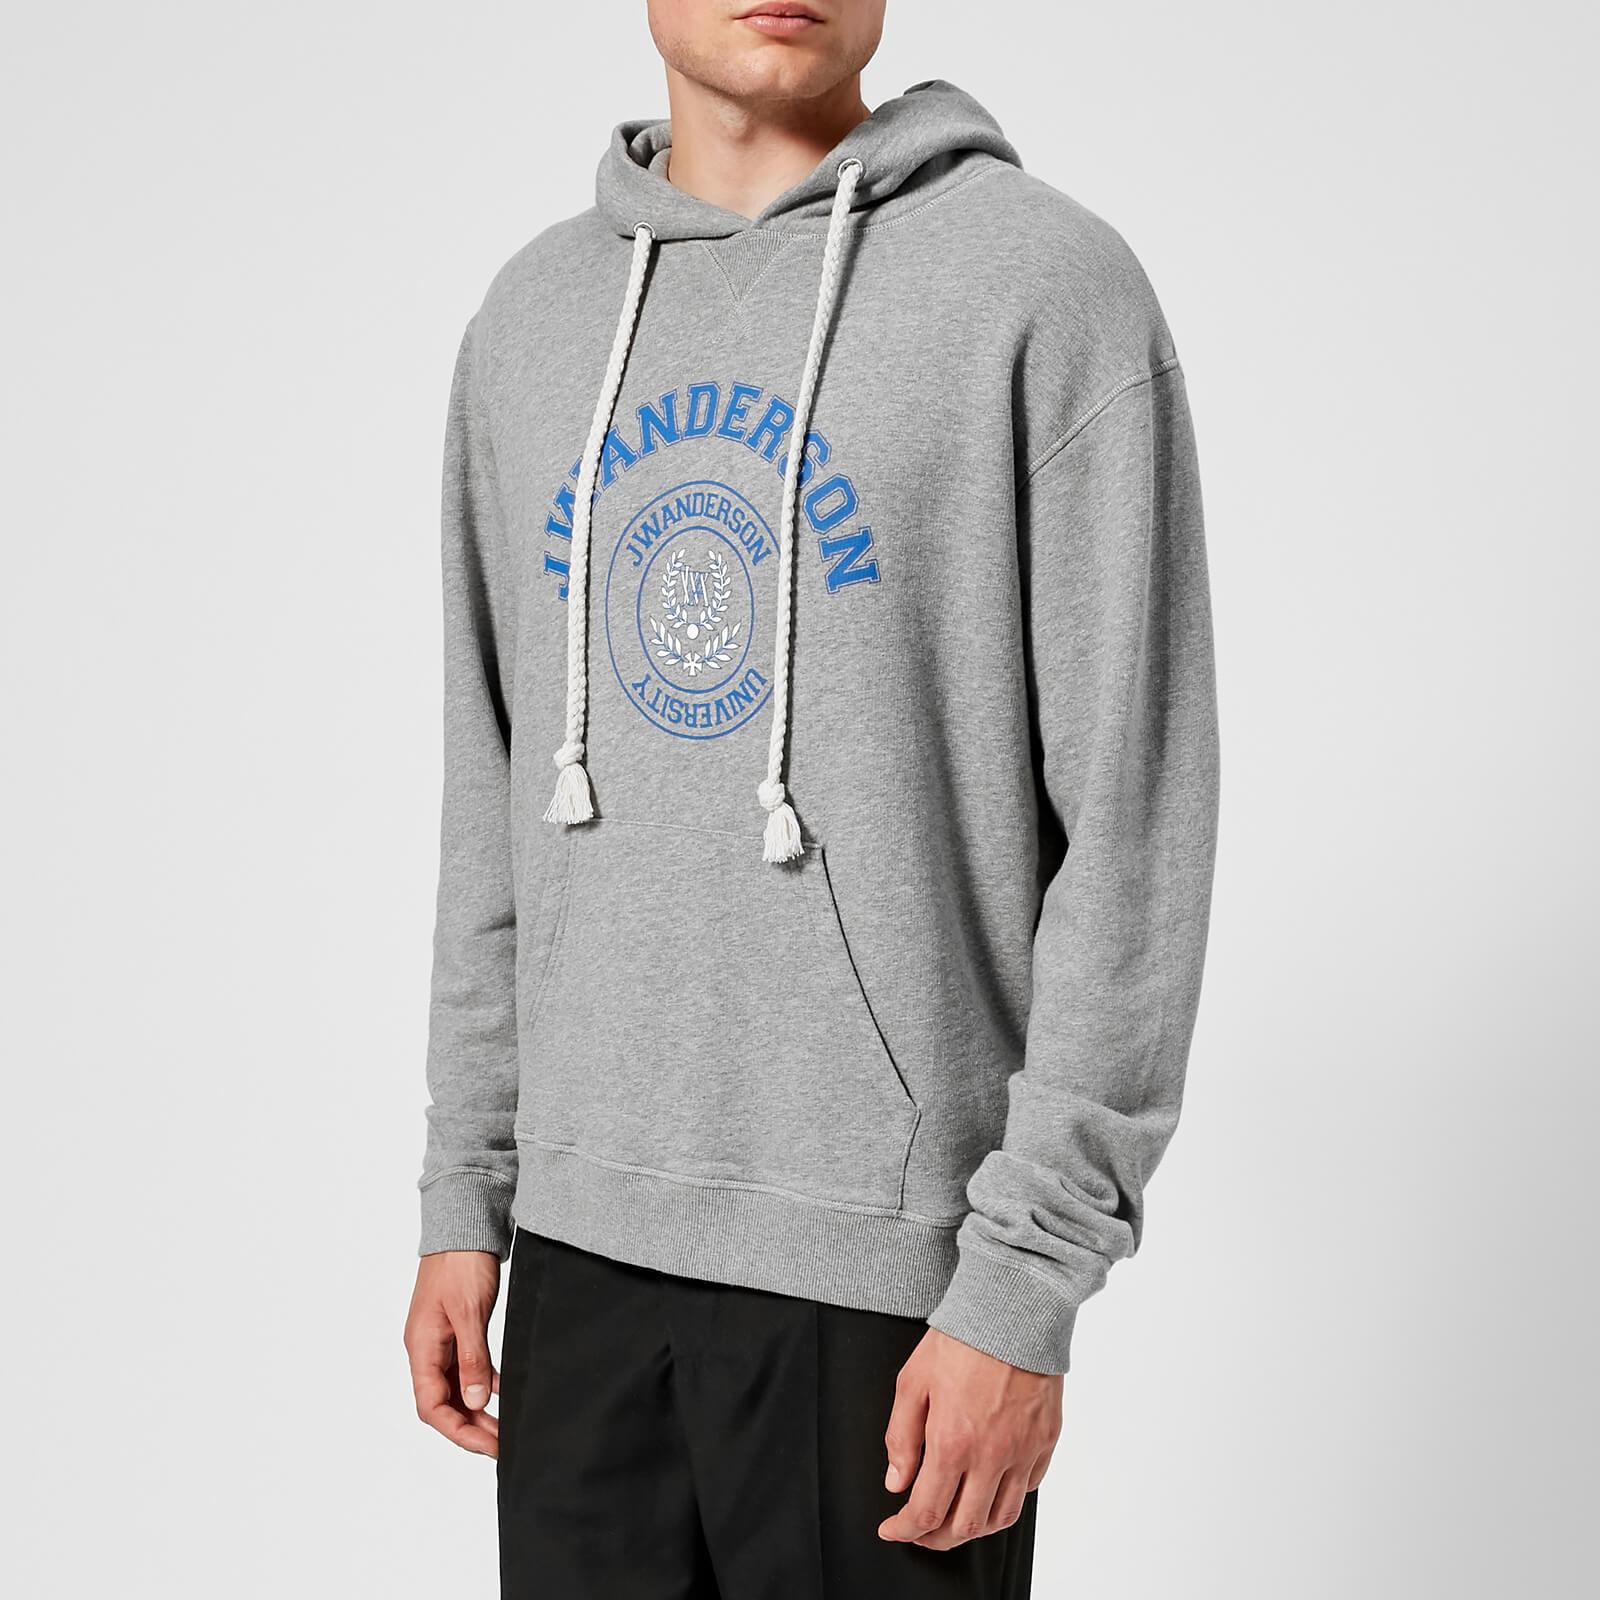 f3182ccb007e0f JW Anderson Men s University Print Hoodie - Light Grey Melange - Free UK  Delivery over £50